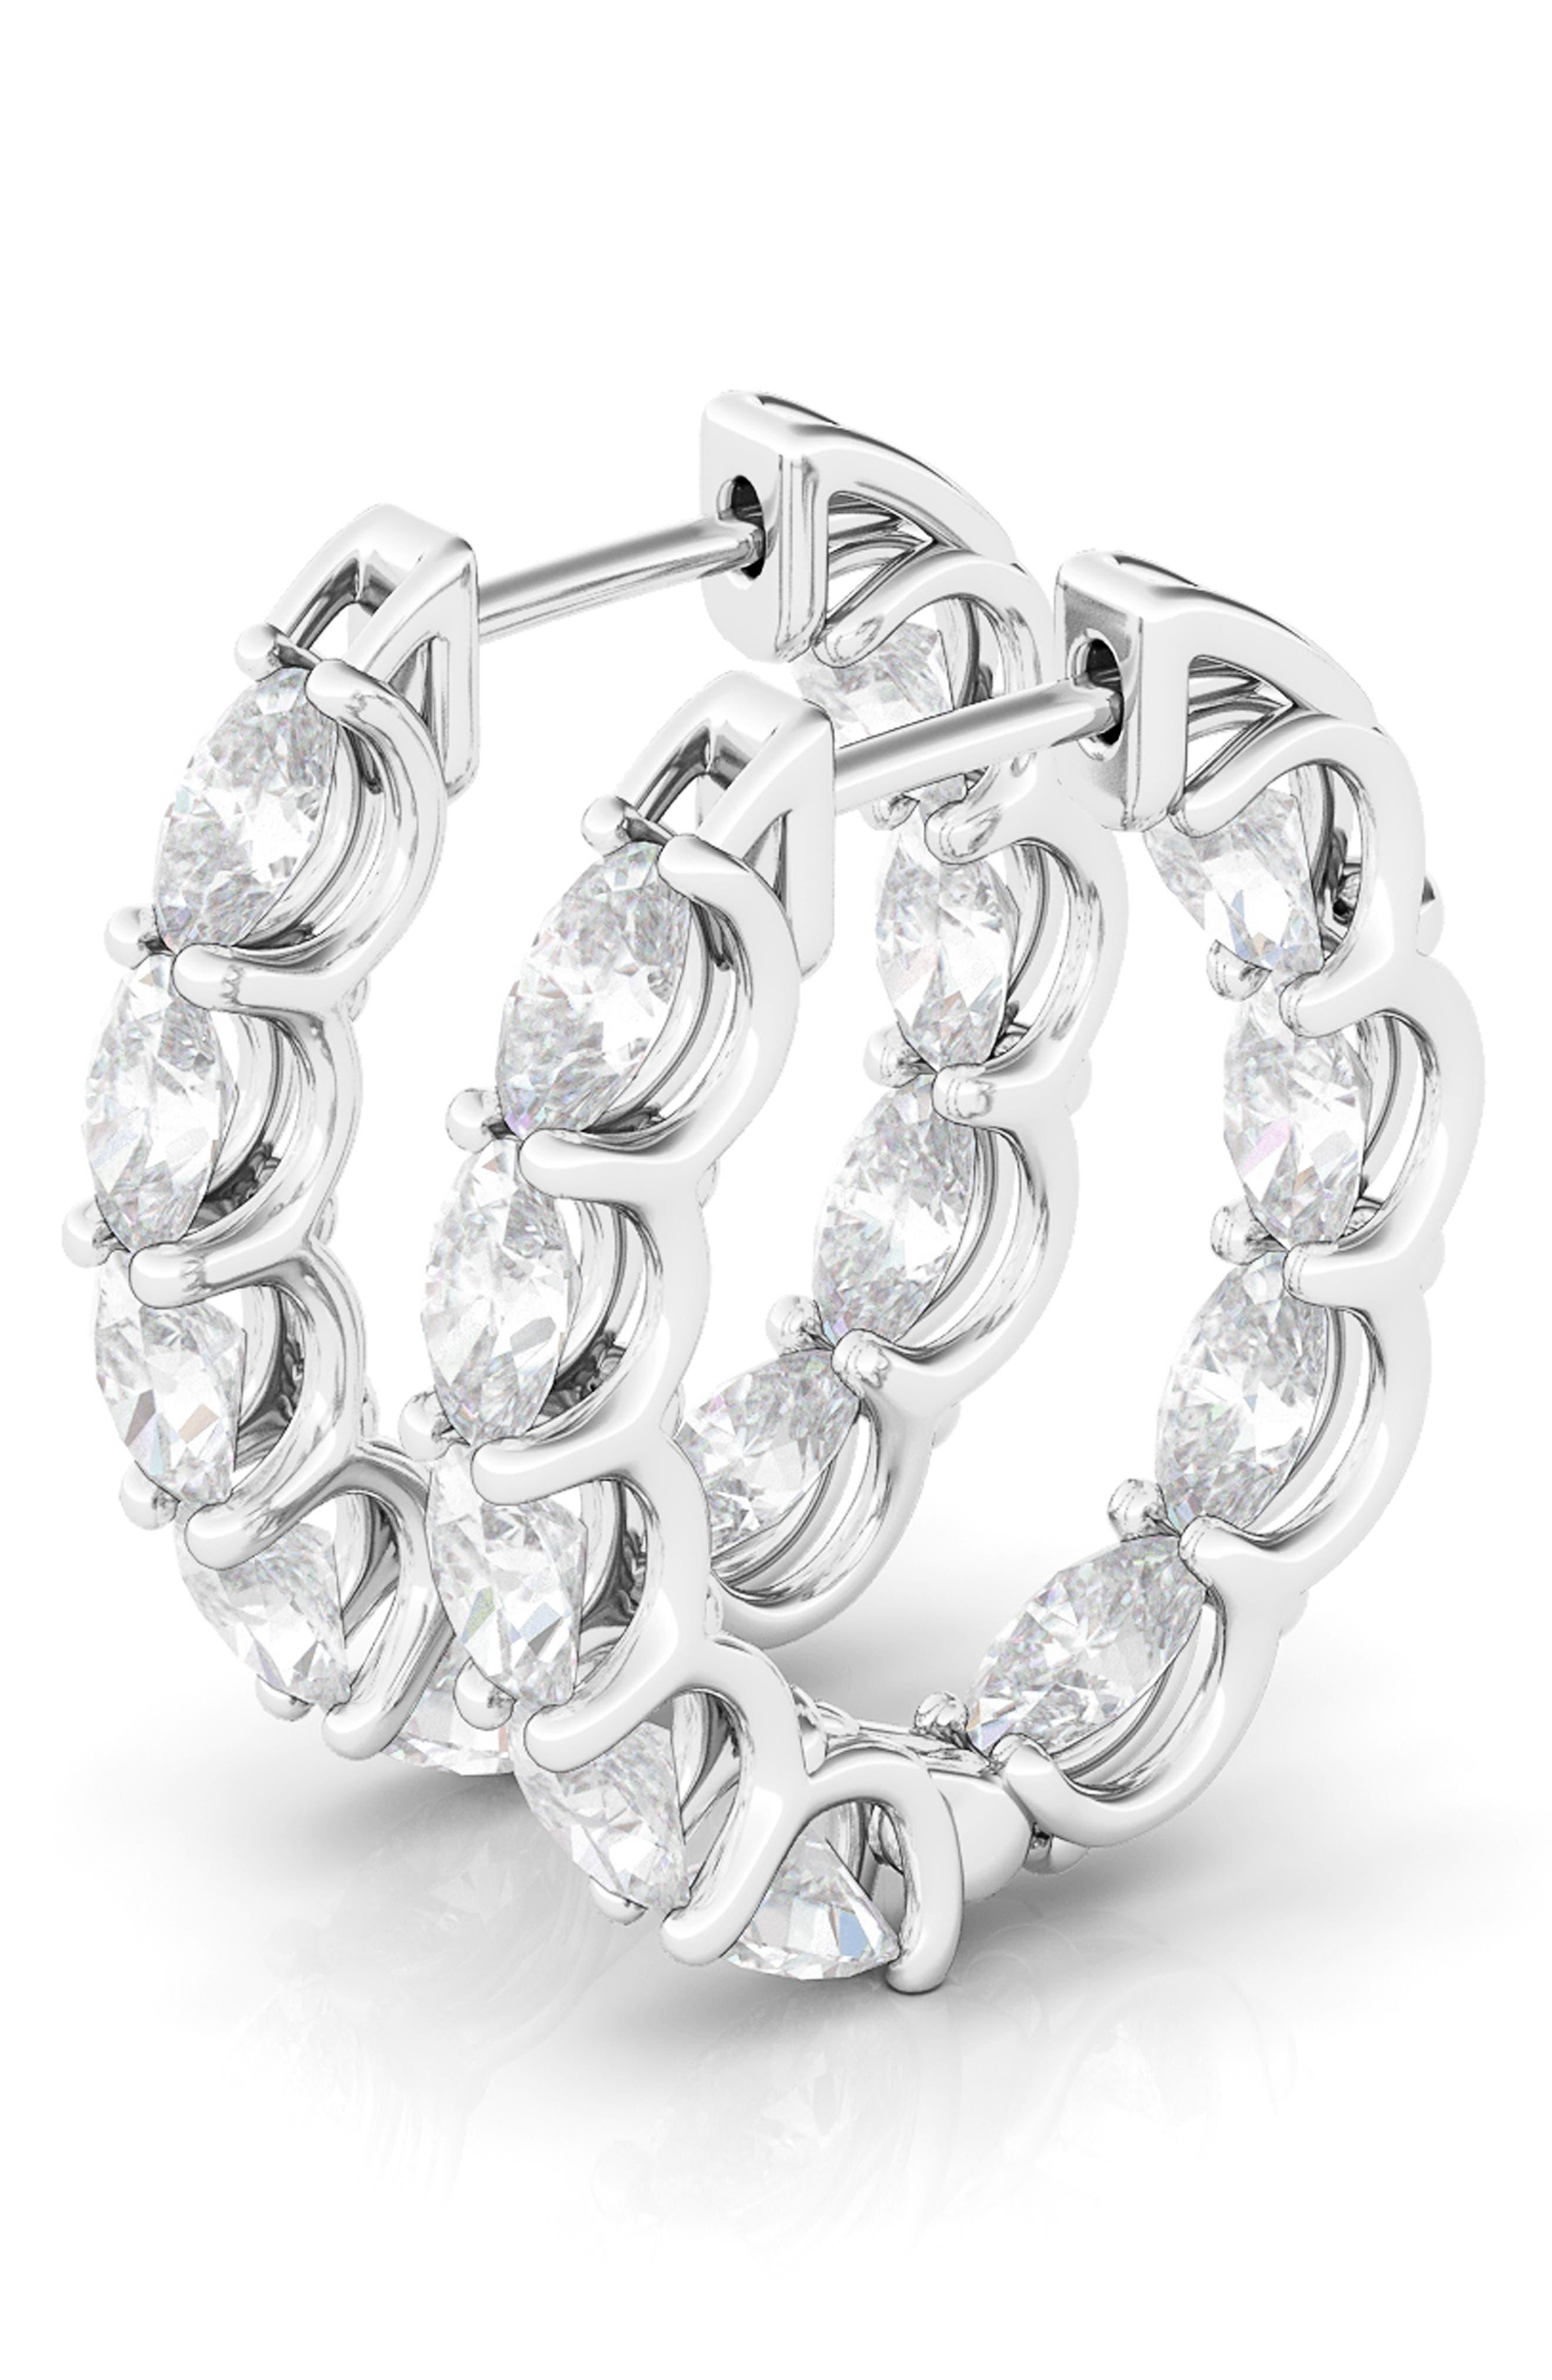 Oval Lab-Created Diamond Inside Out 14K Gold Hoop Earrings